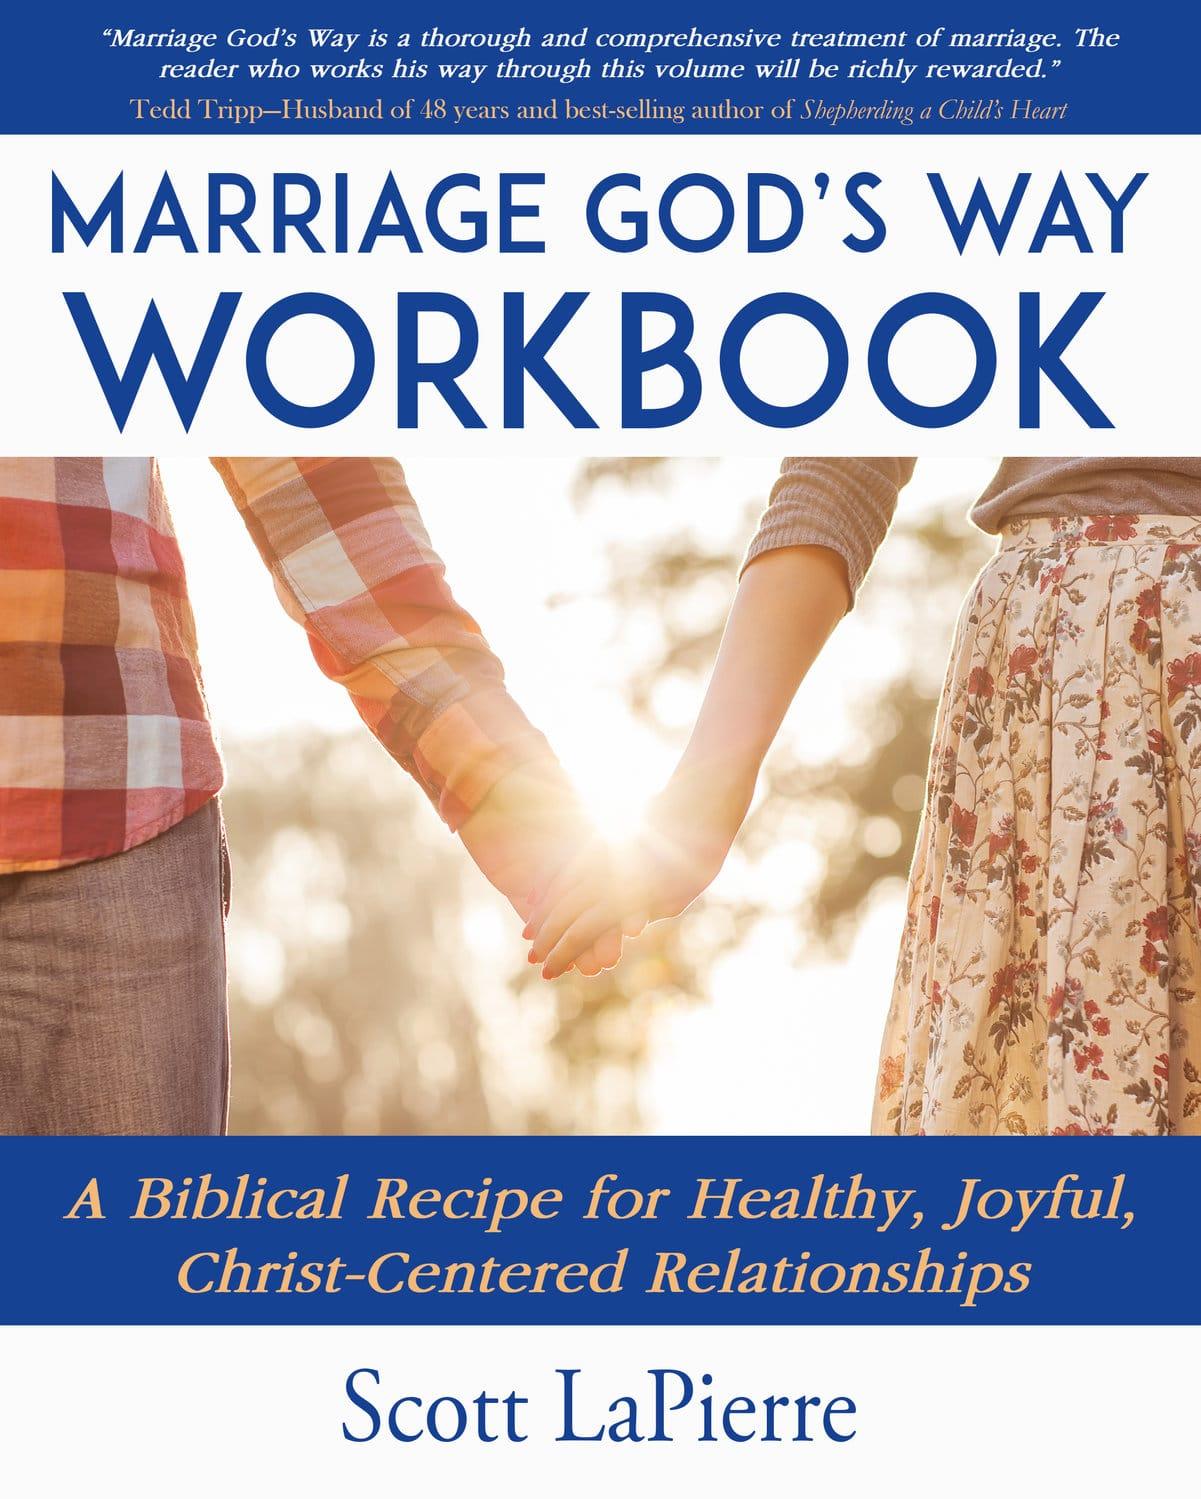 Marriage God's Way Workbook—25% off - Scott LaPierre